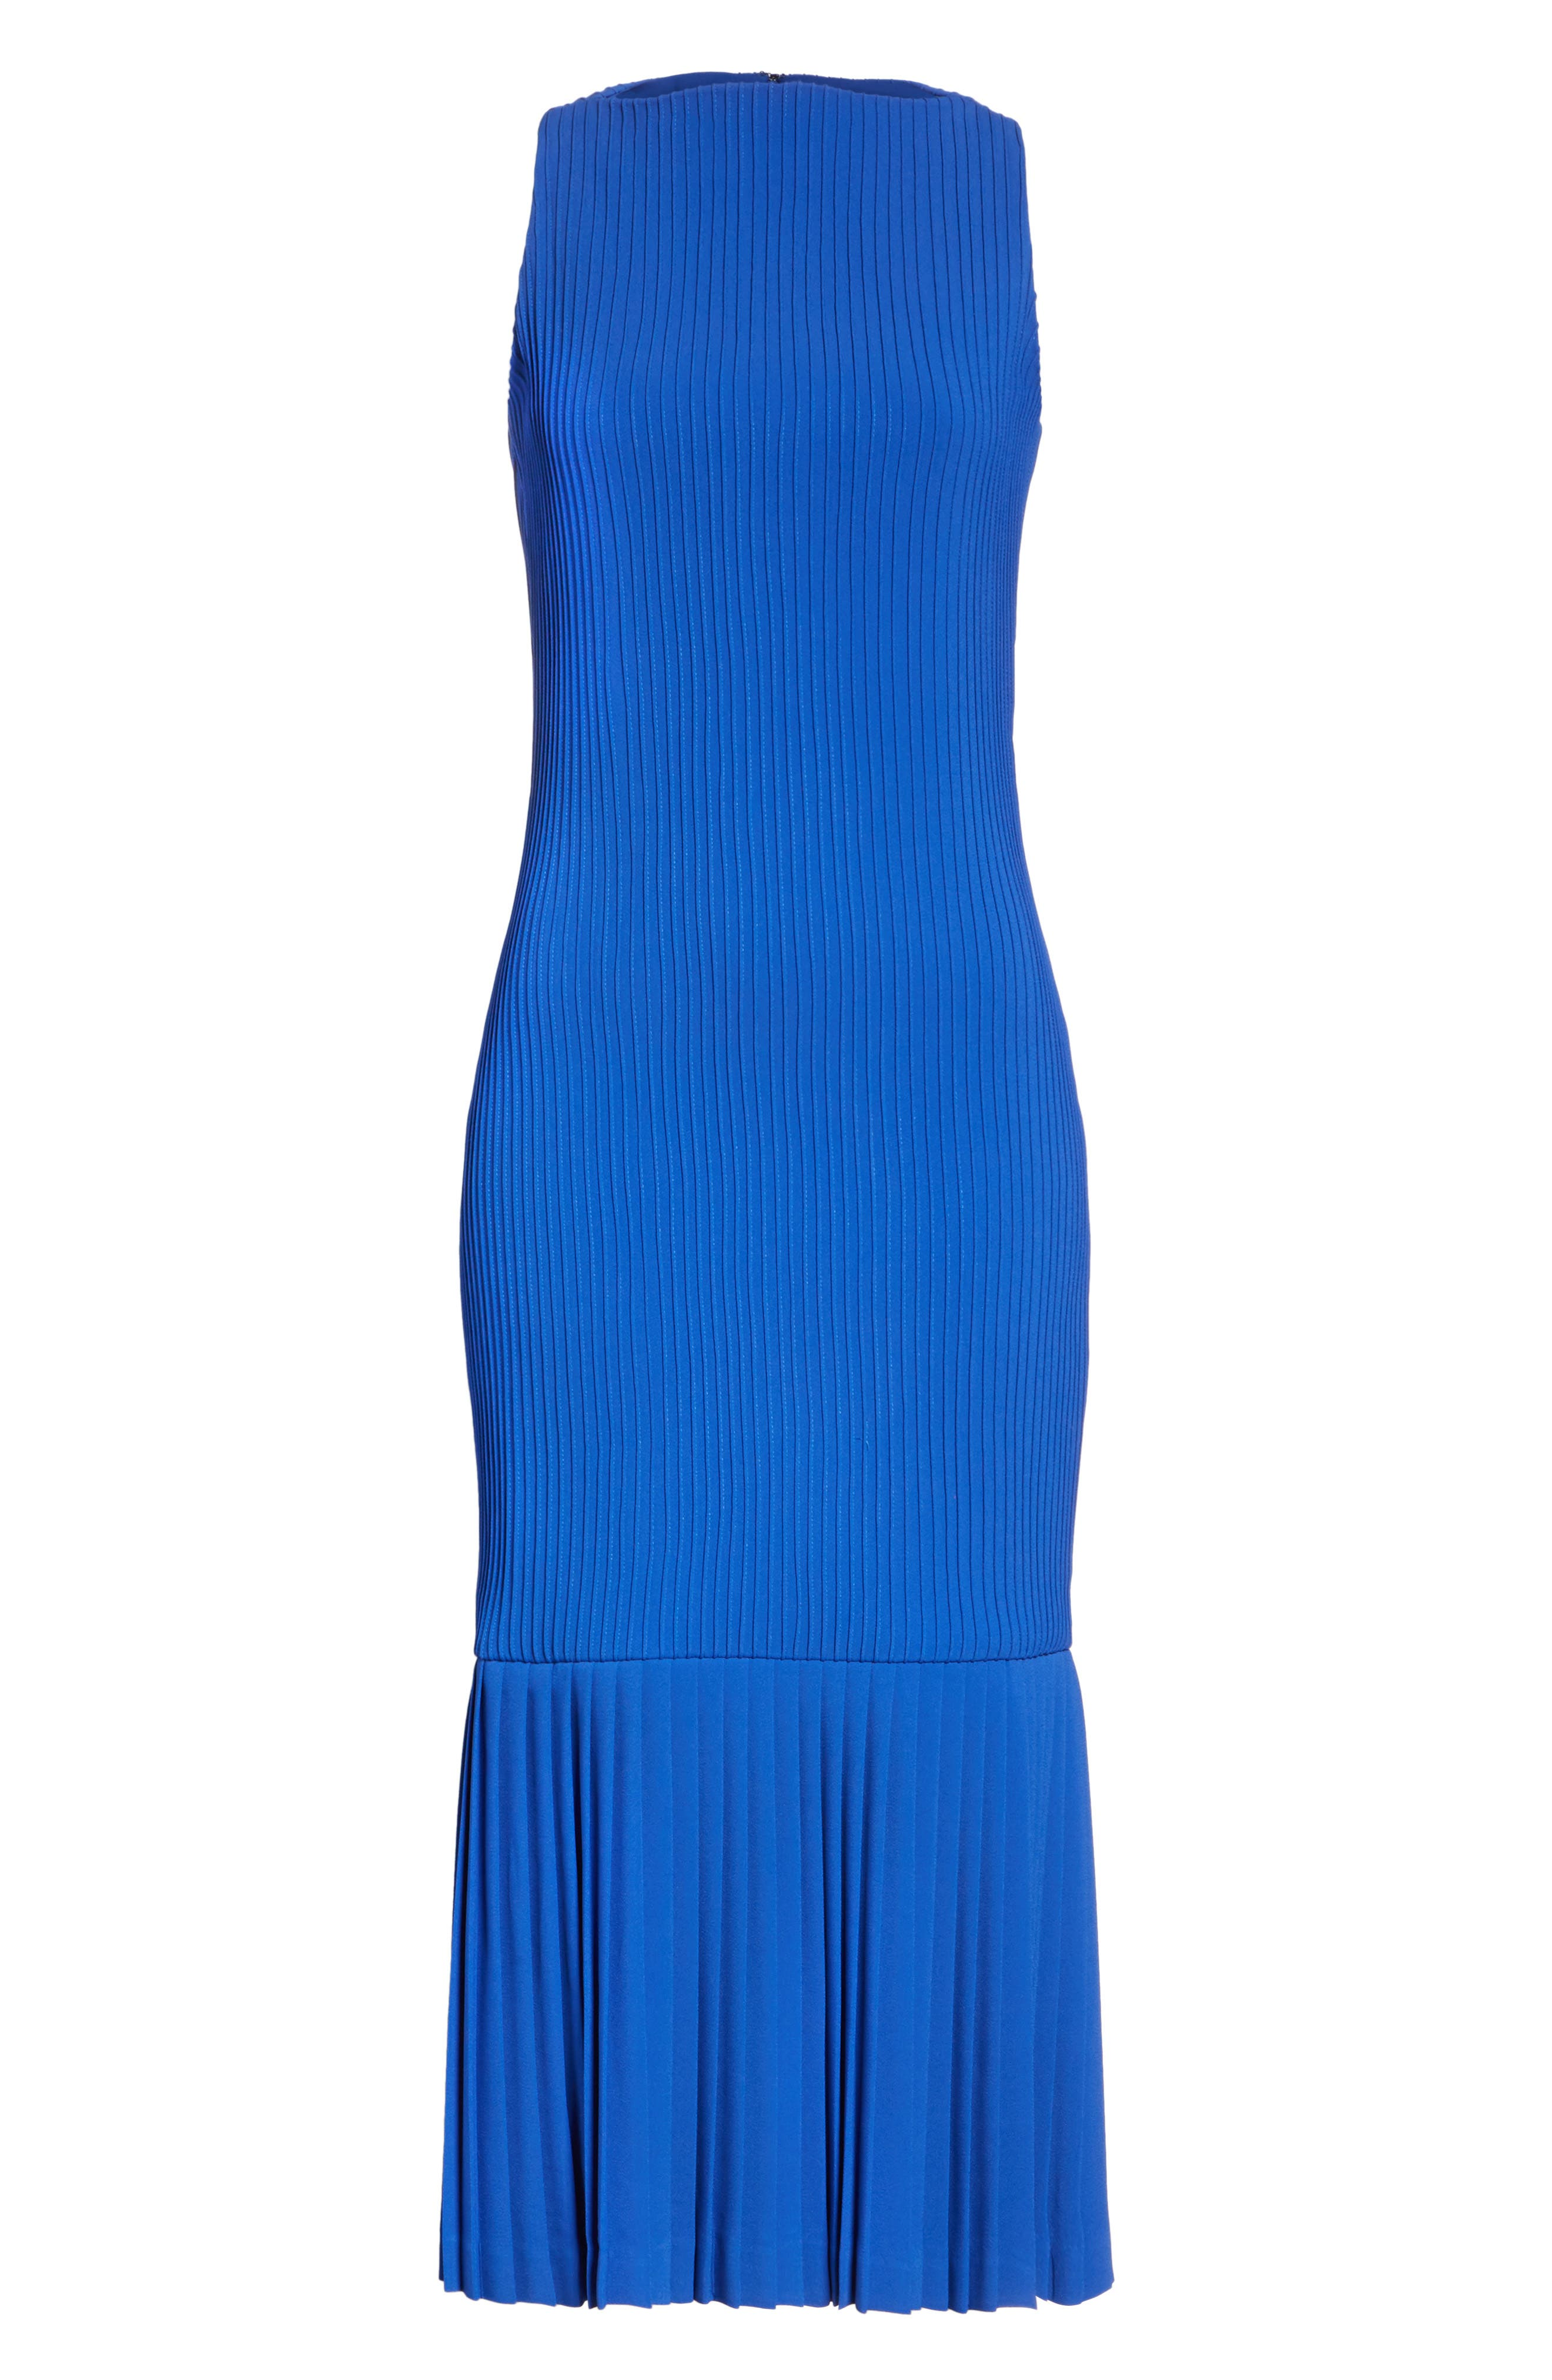 Pintuck Flare Hem Dress,                             Alternate thumbnail 7, color,                             Cobalt